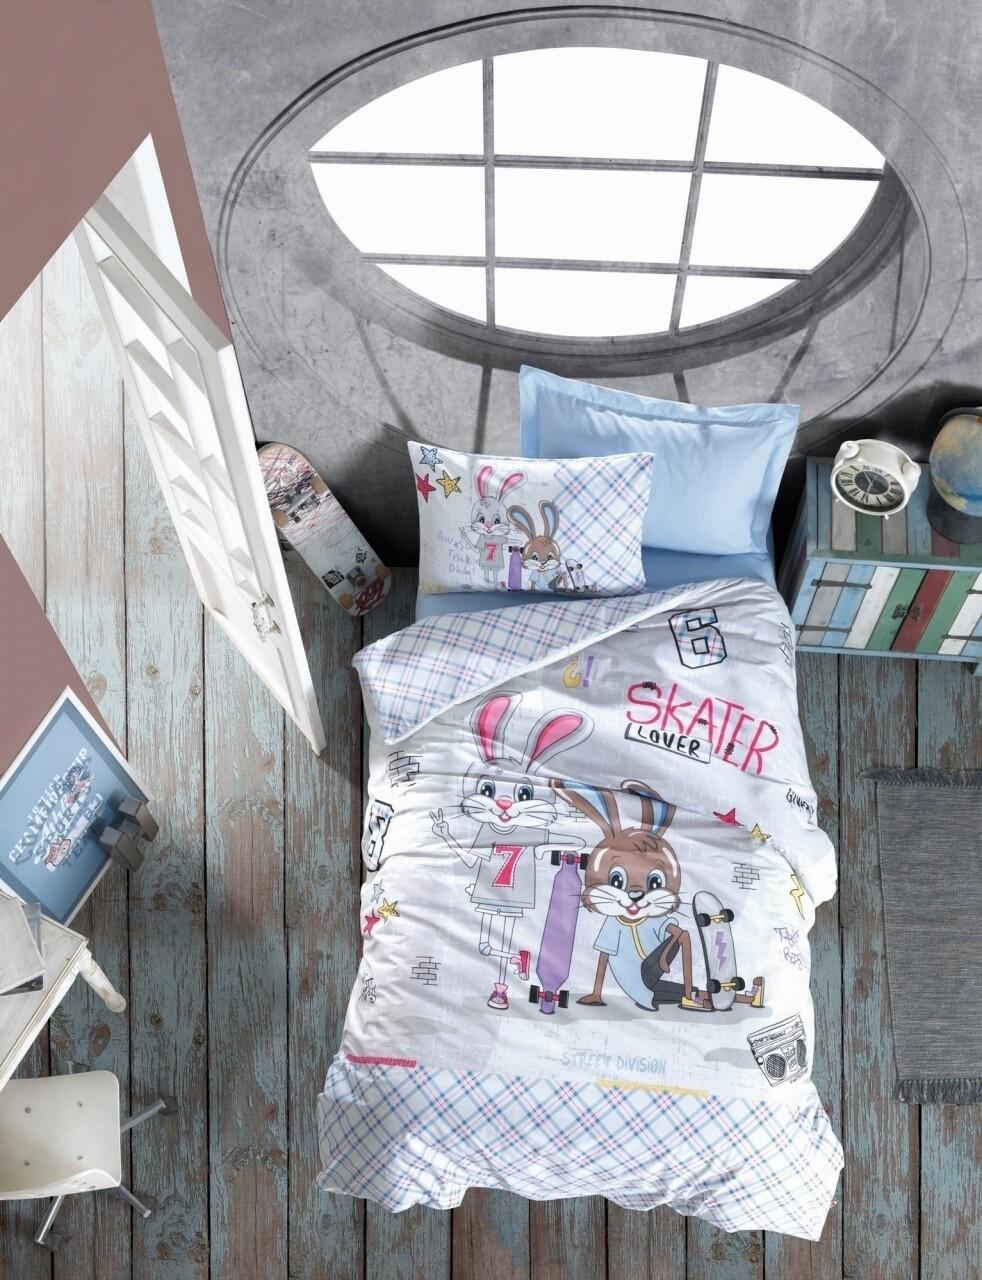 Lenjerie de pat pentru o persoana Skate, Cotton Box, 3 piese, 160 x 240 cm, 100% bumbac ranforce, multicolora